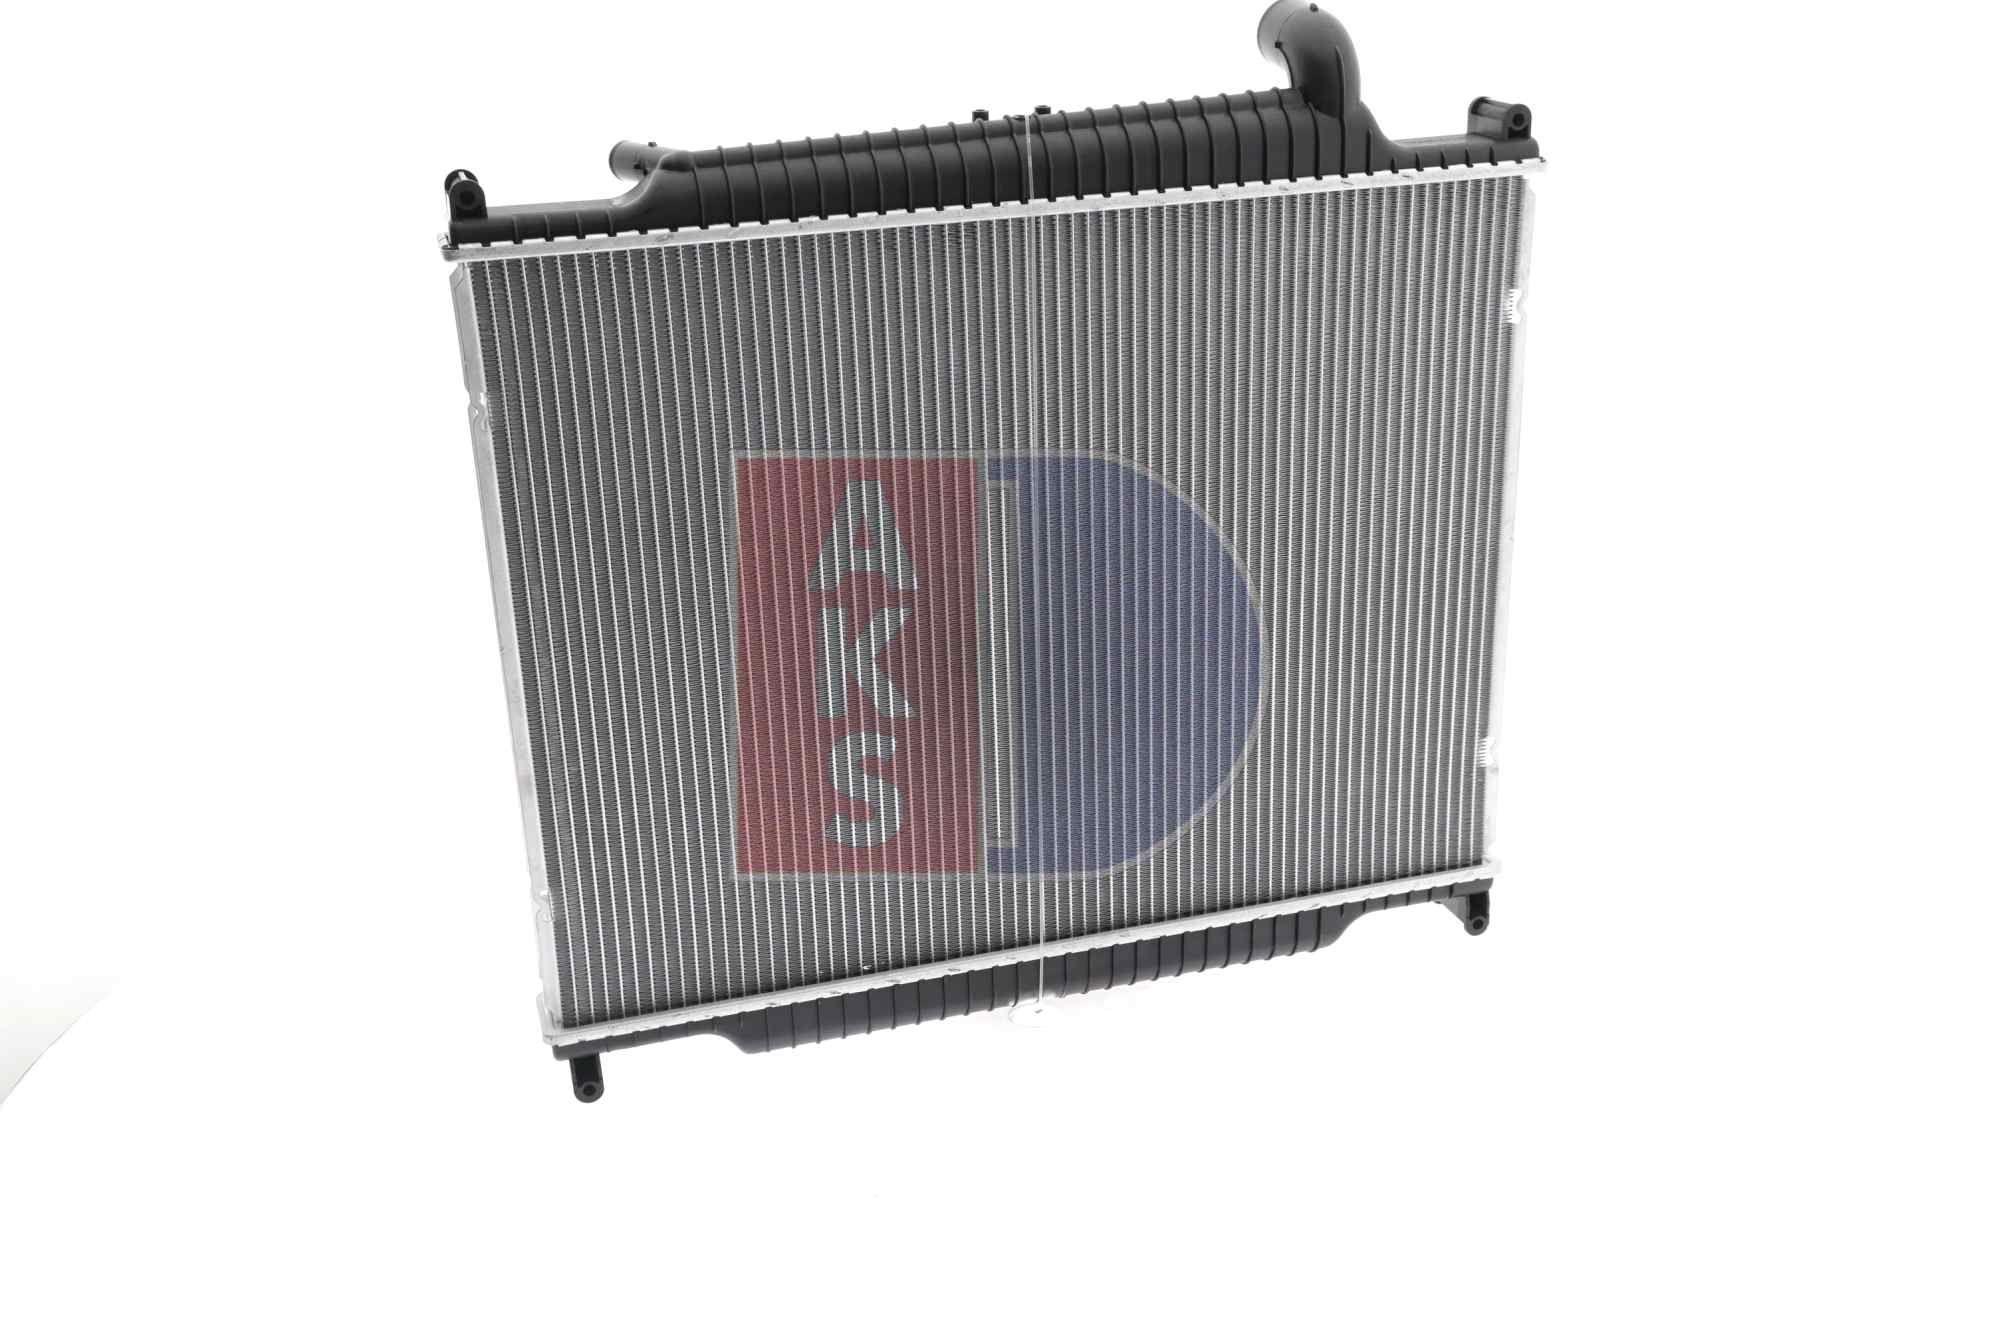 Kühler, Motorkühlung 020023N von AKS DASIS